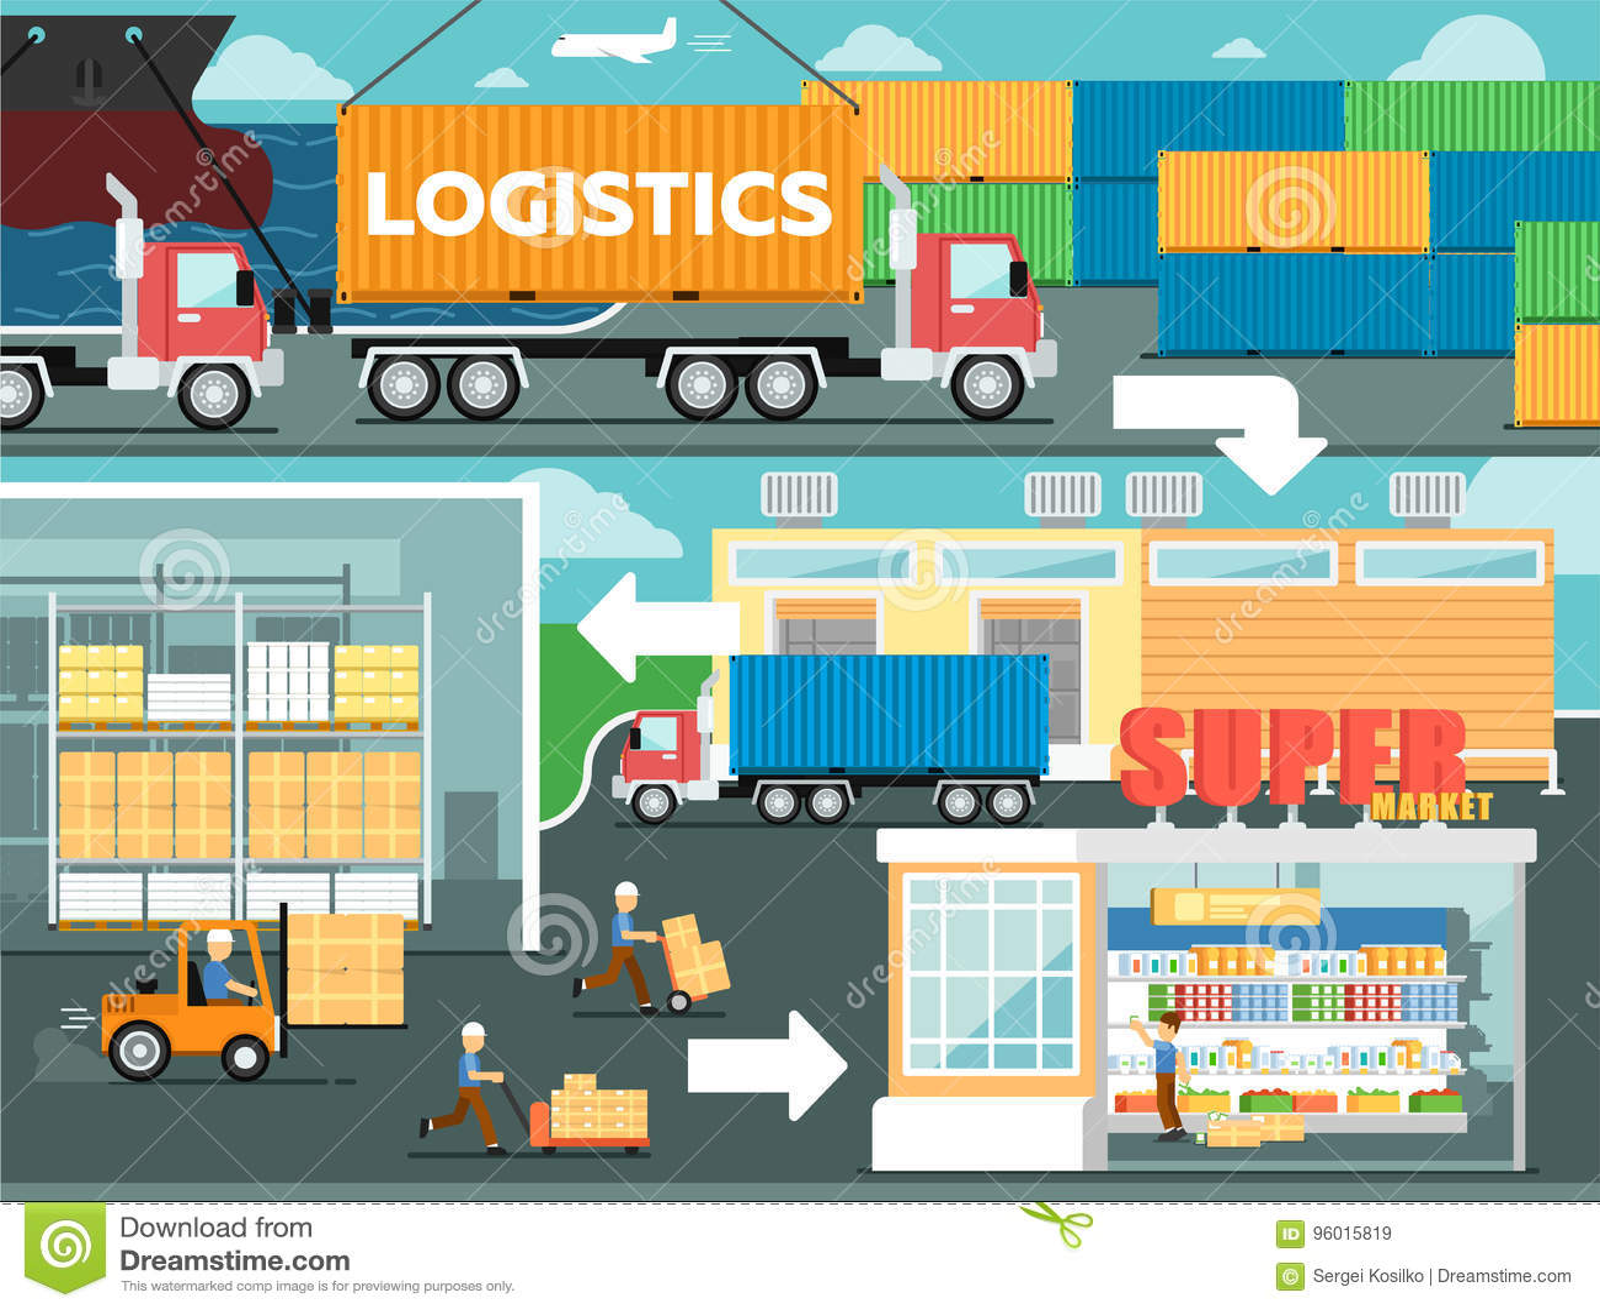 De logistiekdienst en kleinhandelsaffiche